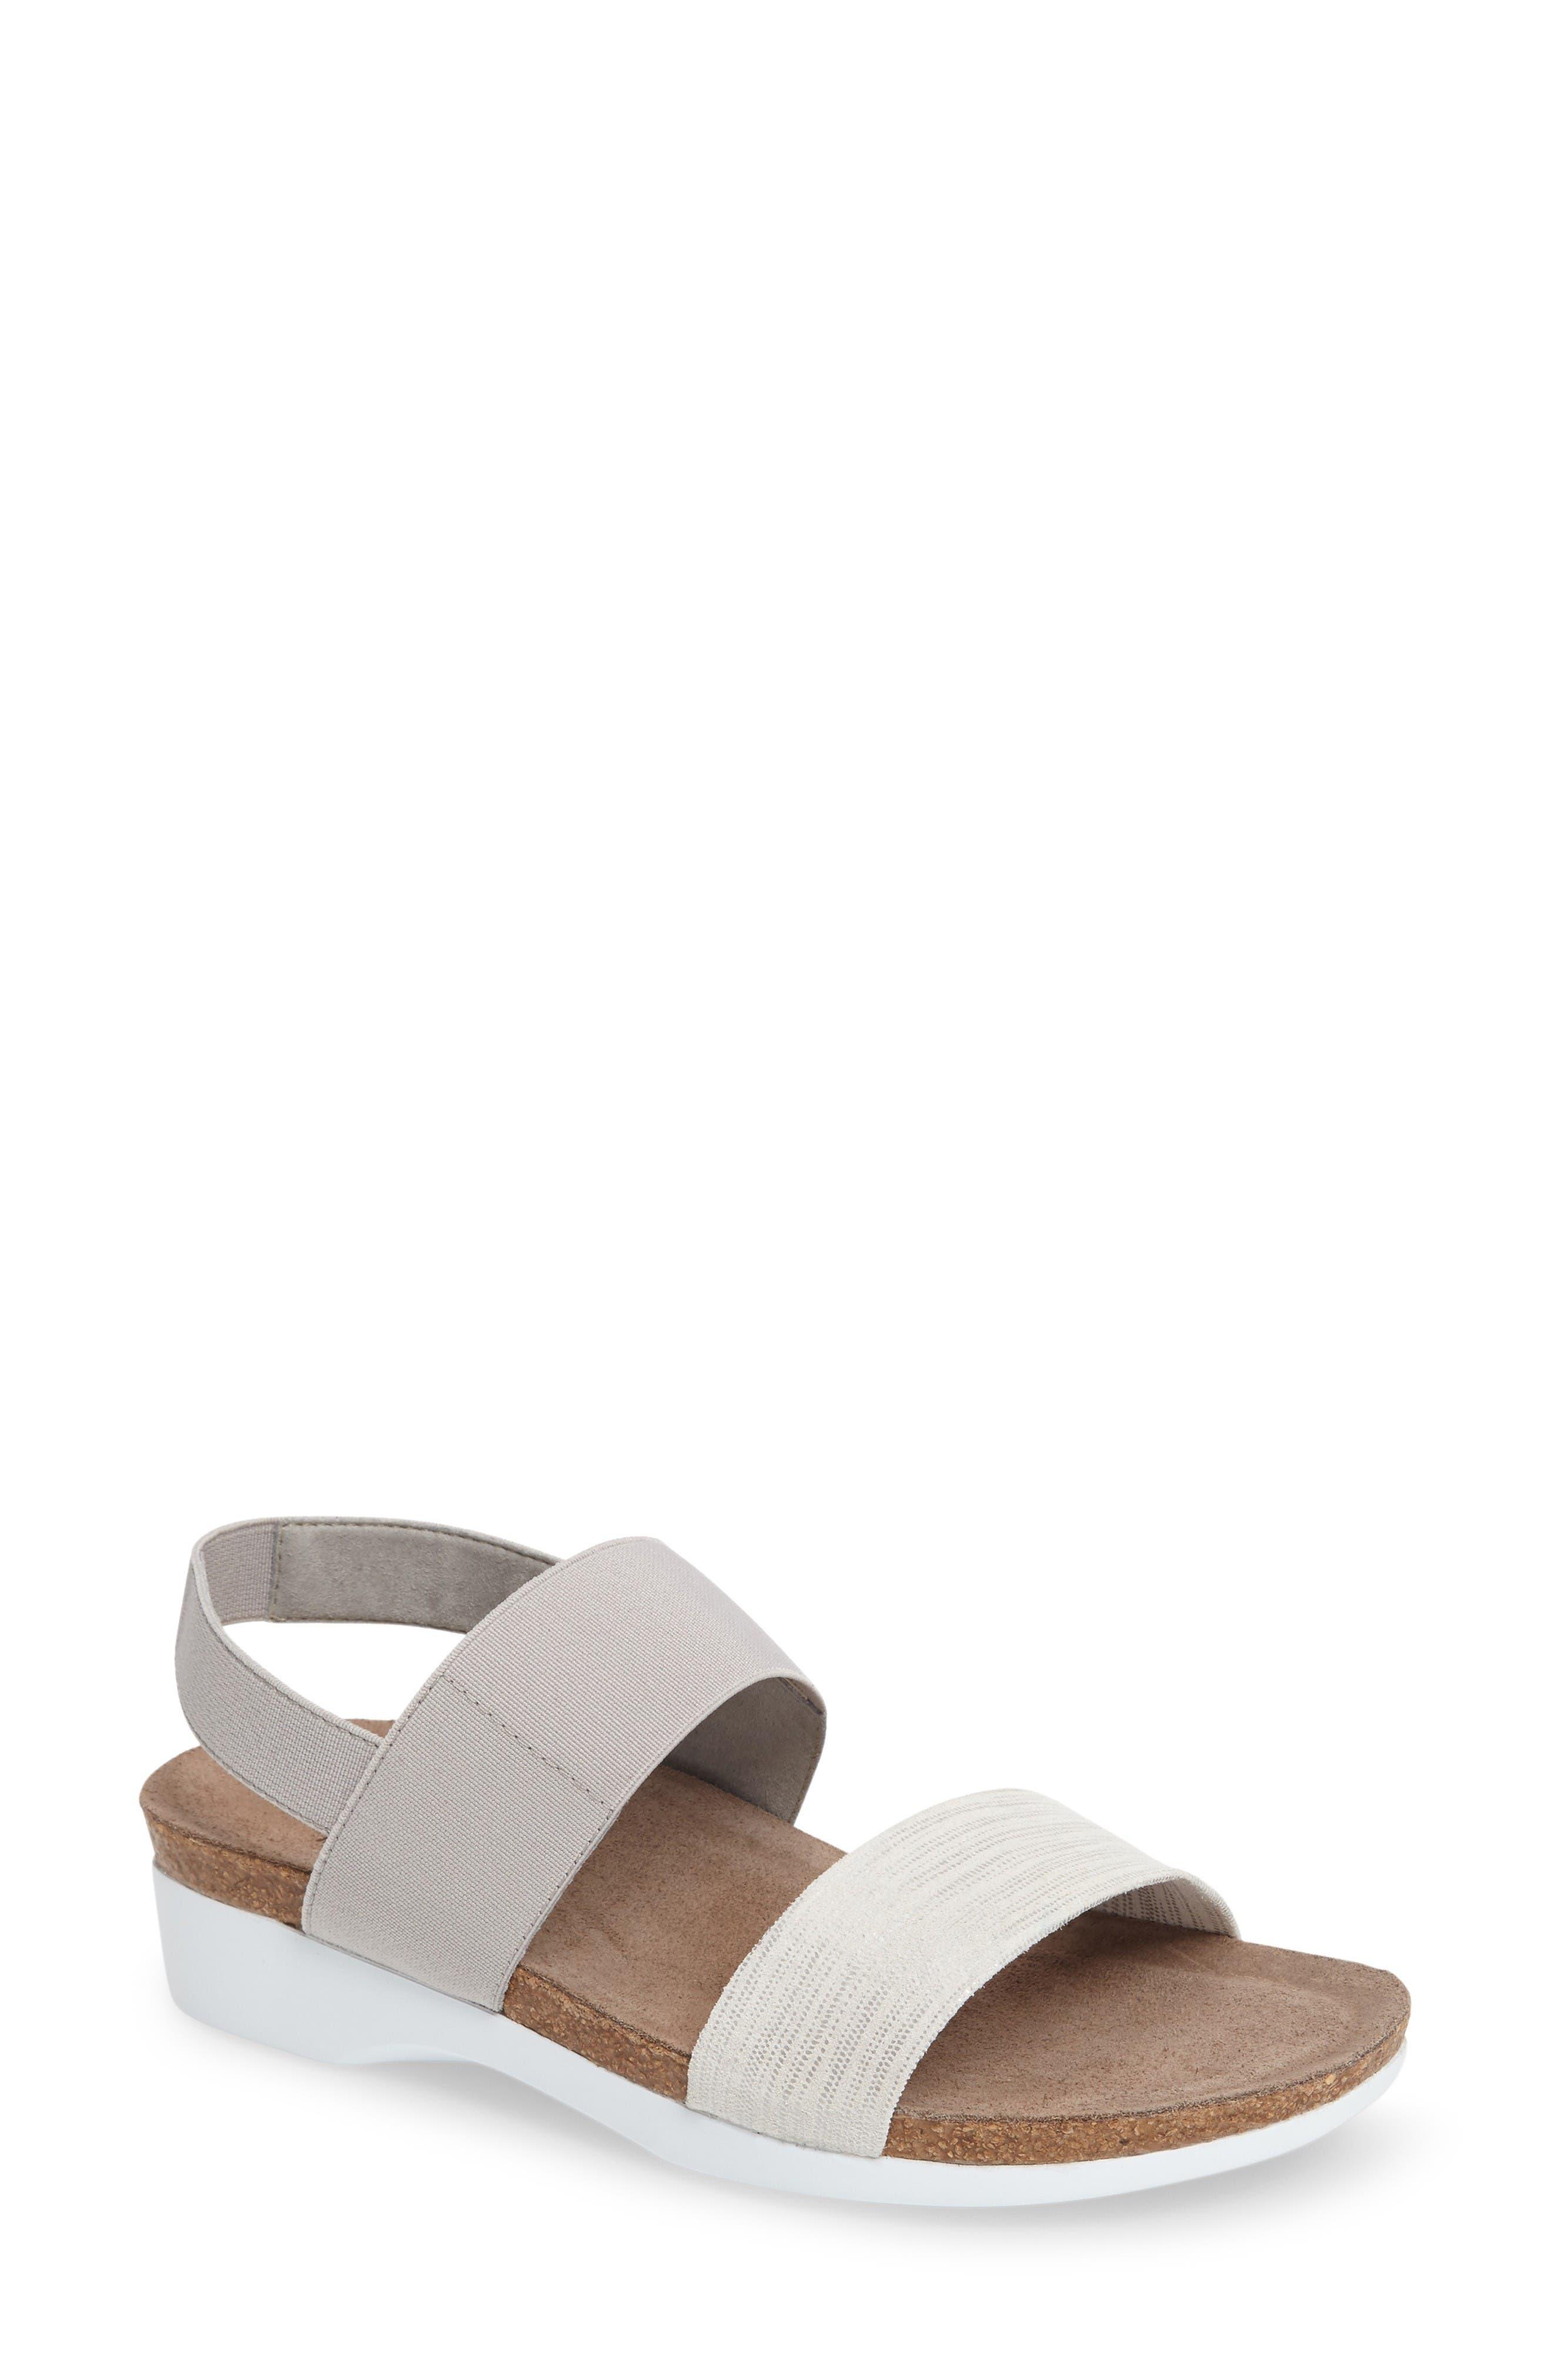 Alternate Image 1 Selected - Munro 'Pisces' Sandal